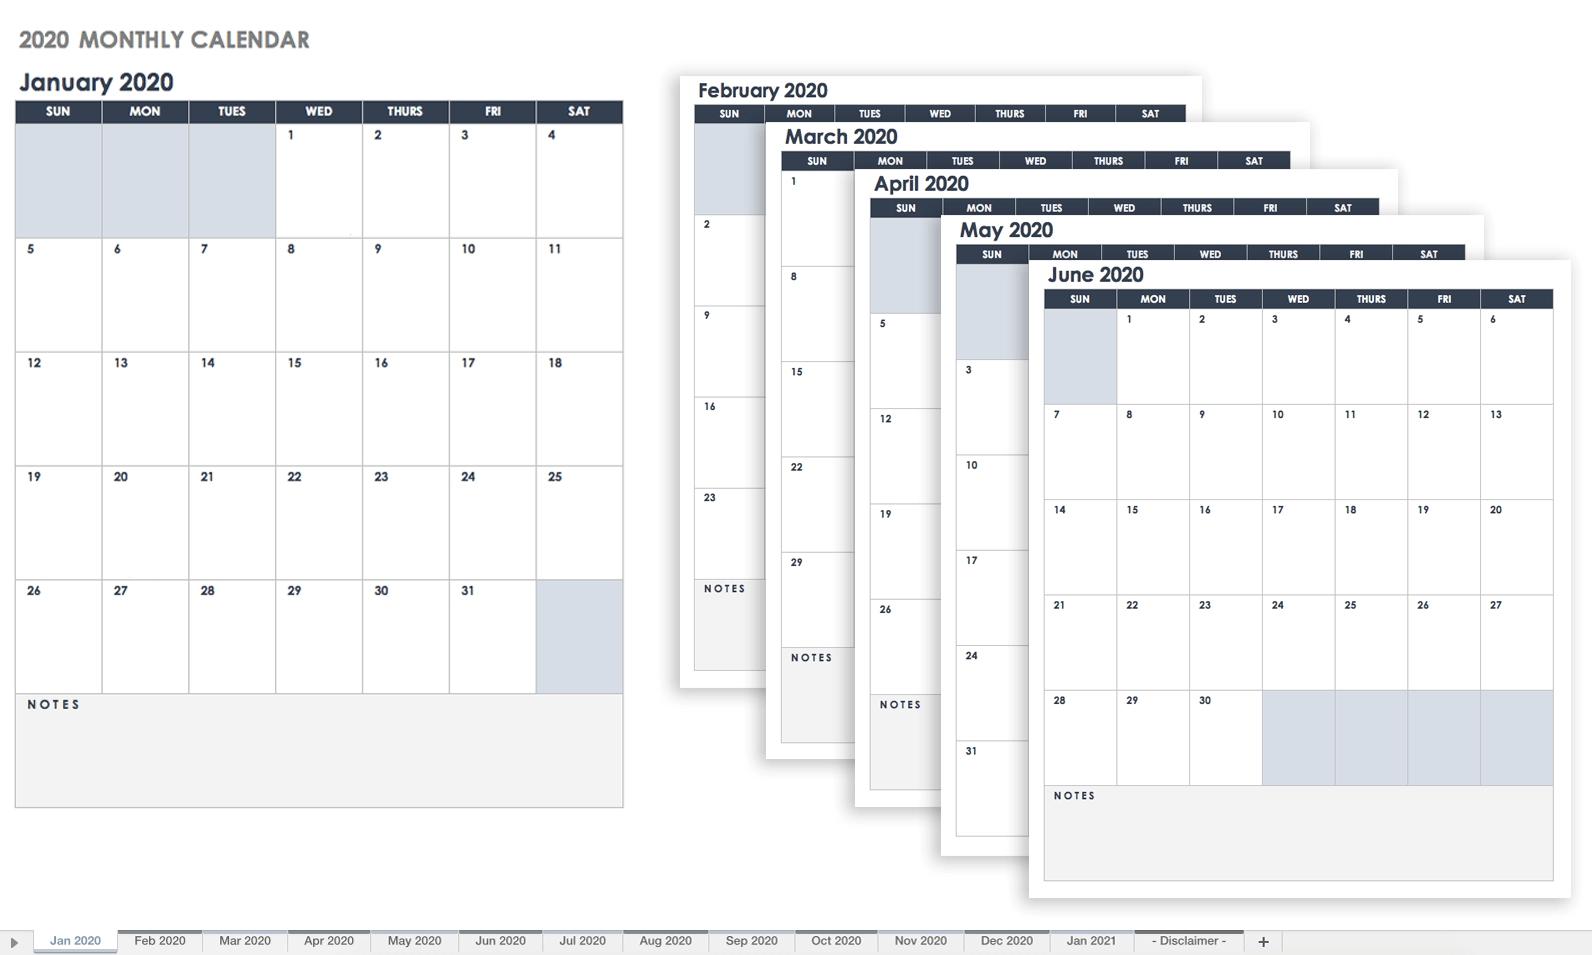 Free Google Calendar Templates | Smartsheet-2020 Monthly Calendar Smartsheet